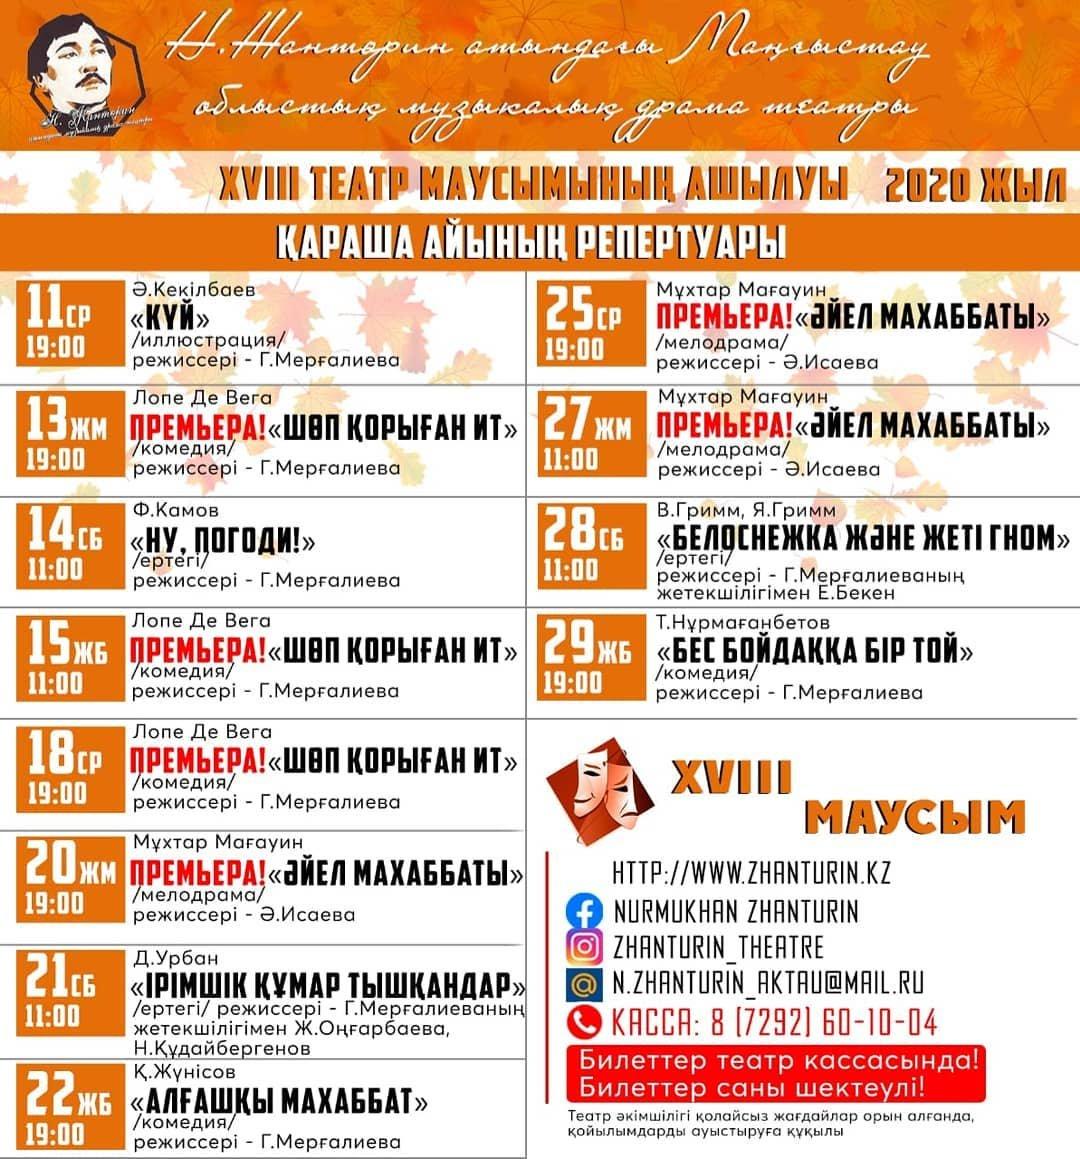 Репертуар театра имени Н.Жанторина на ноябрь